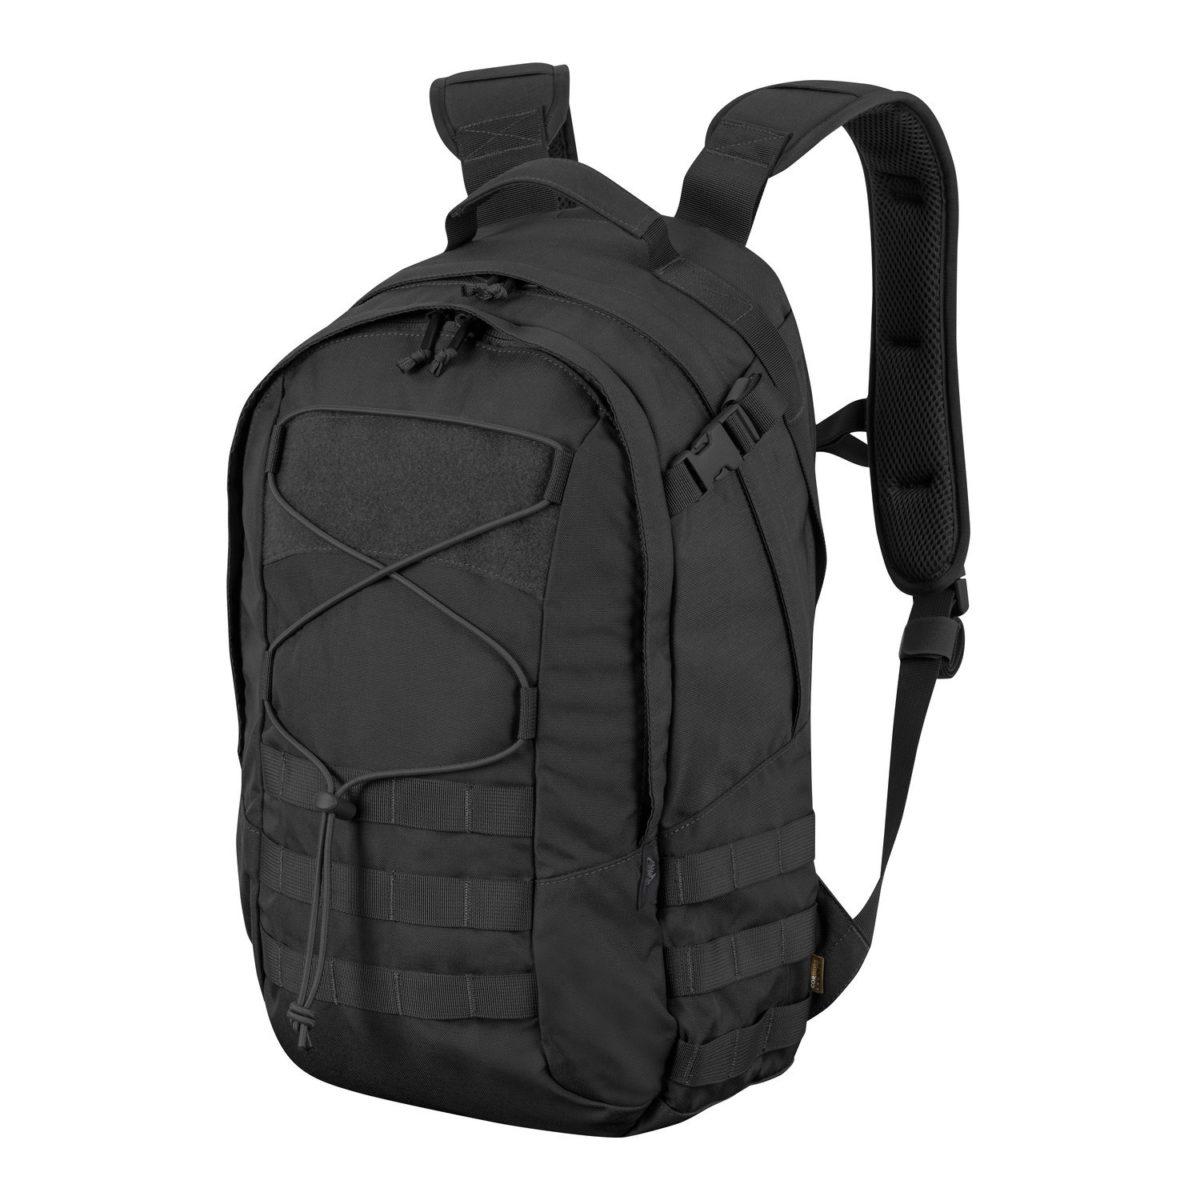 Batoh Ranger EDC PACK® ČIERNY 1